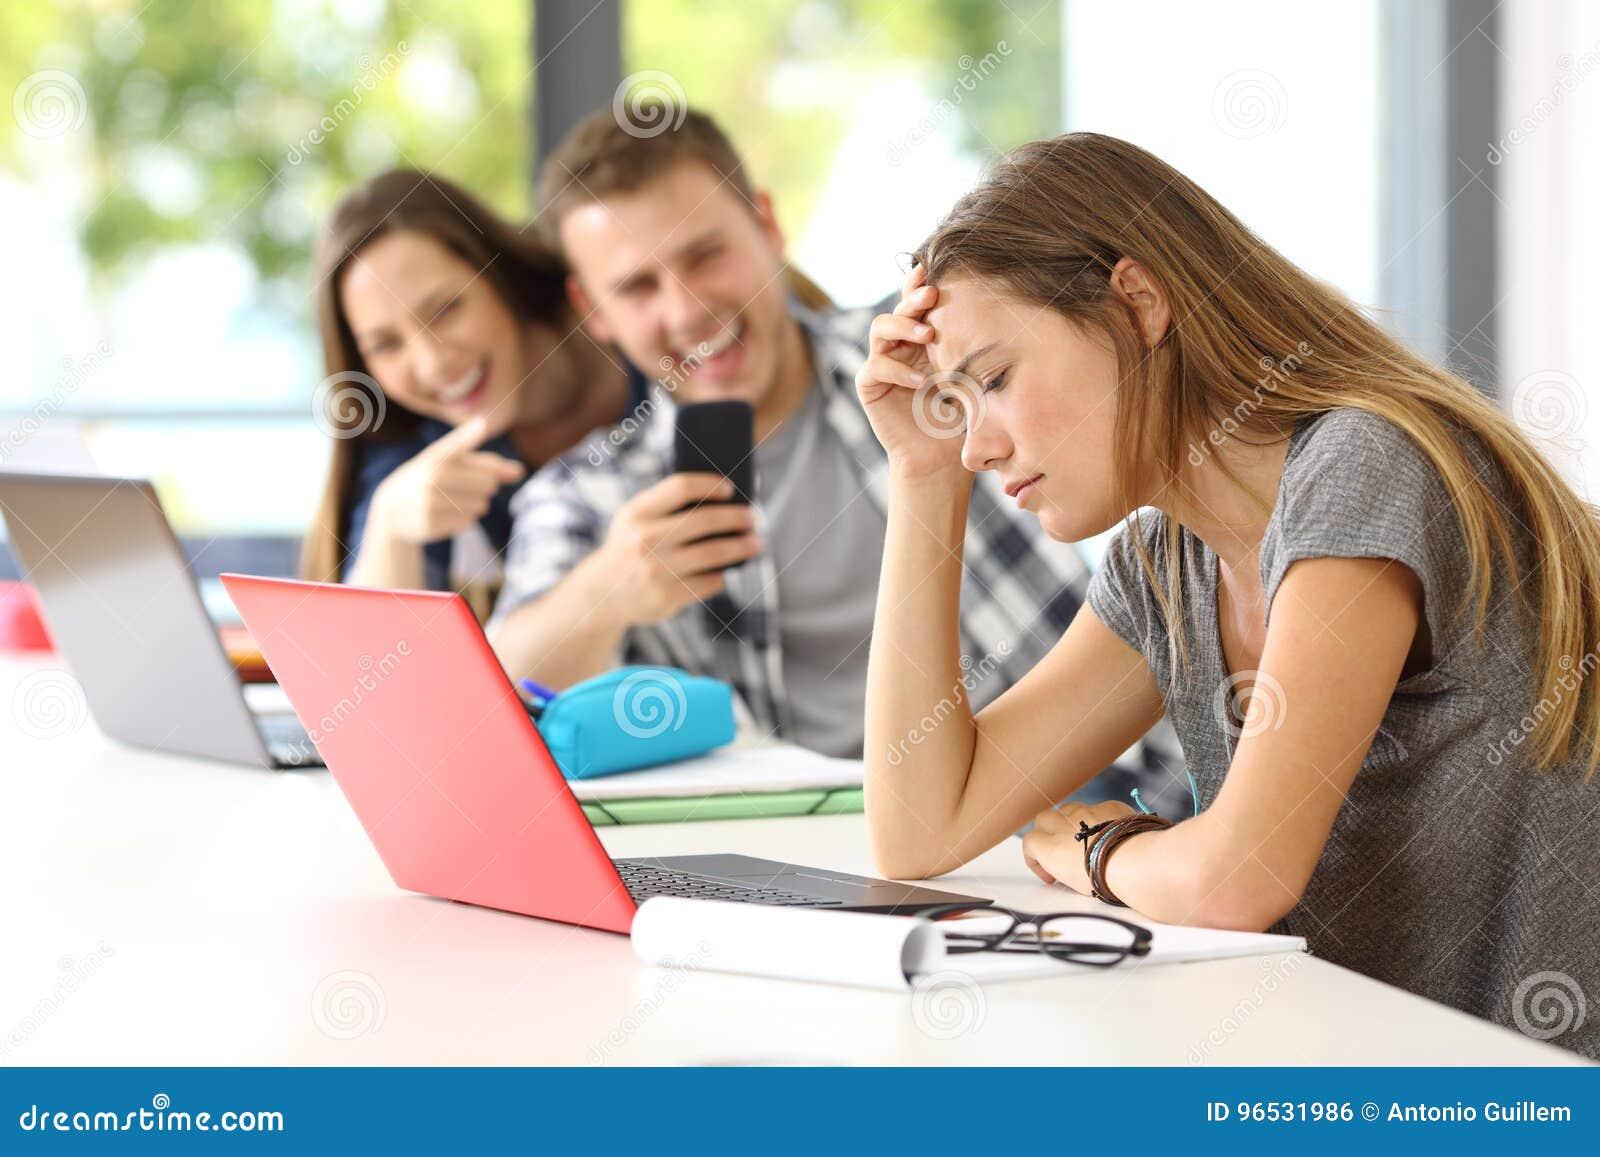 Sad student victim of cyber bullying